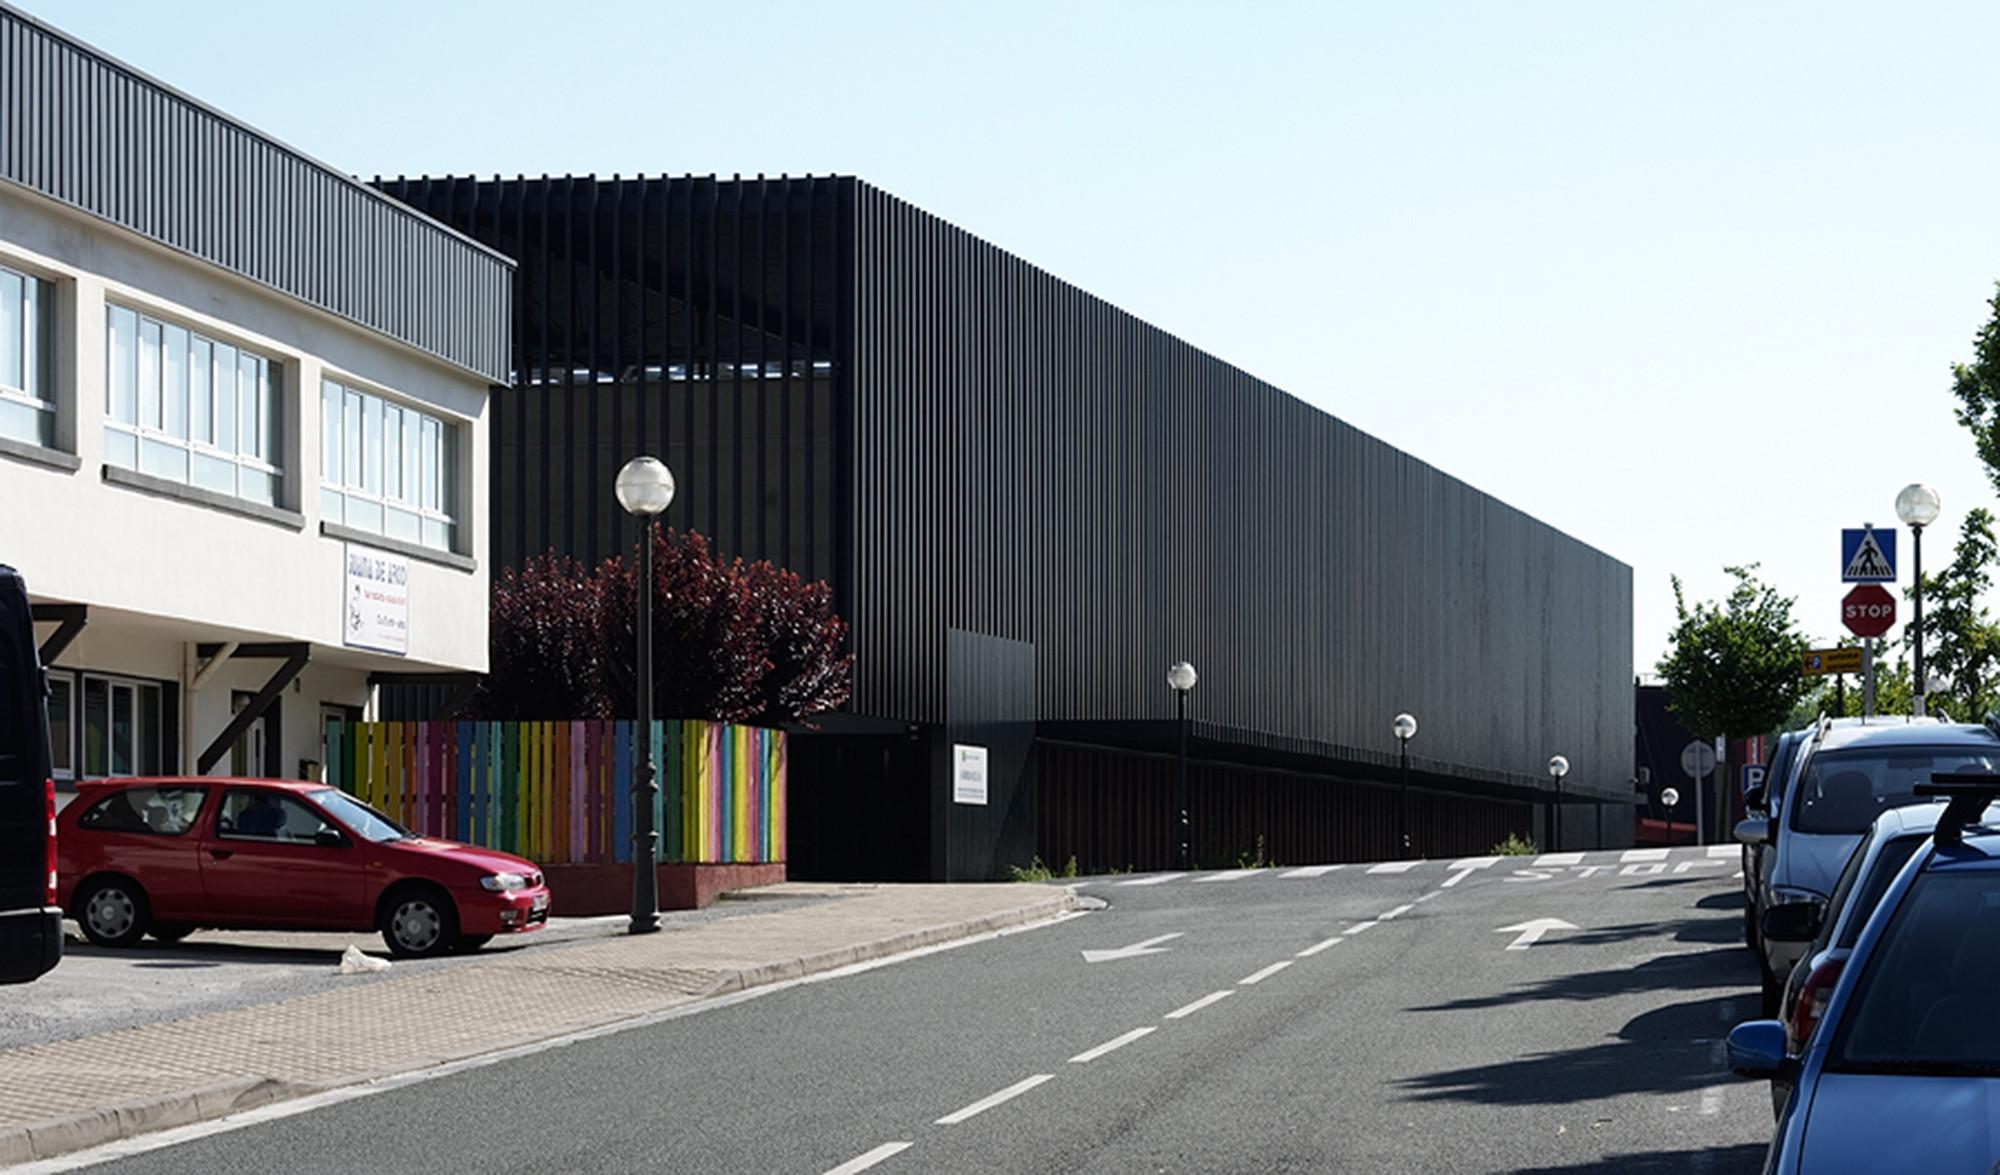 Gordailu Building  / Astigarraga y Lasarte, © Jorge Allende